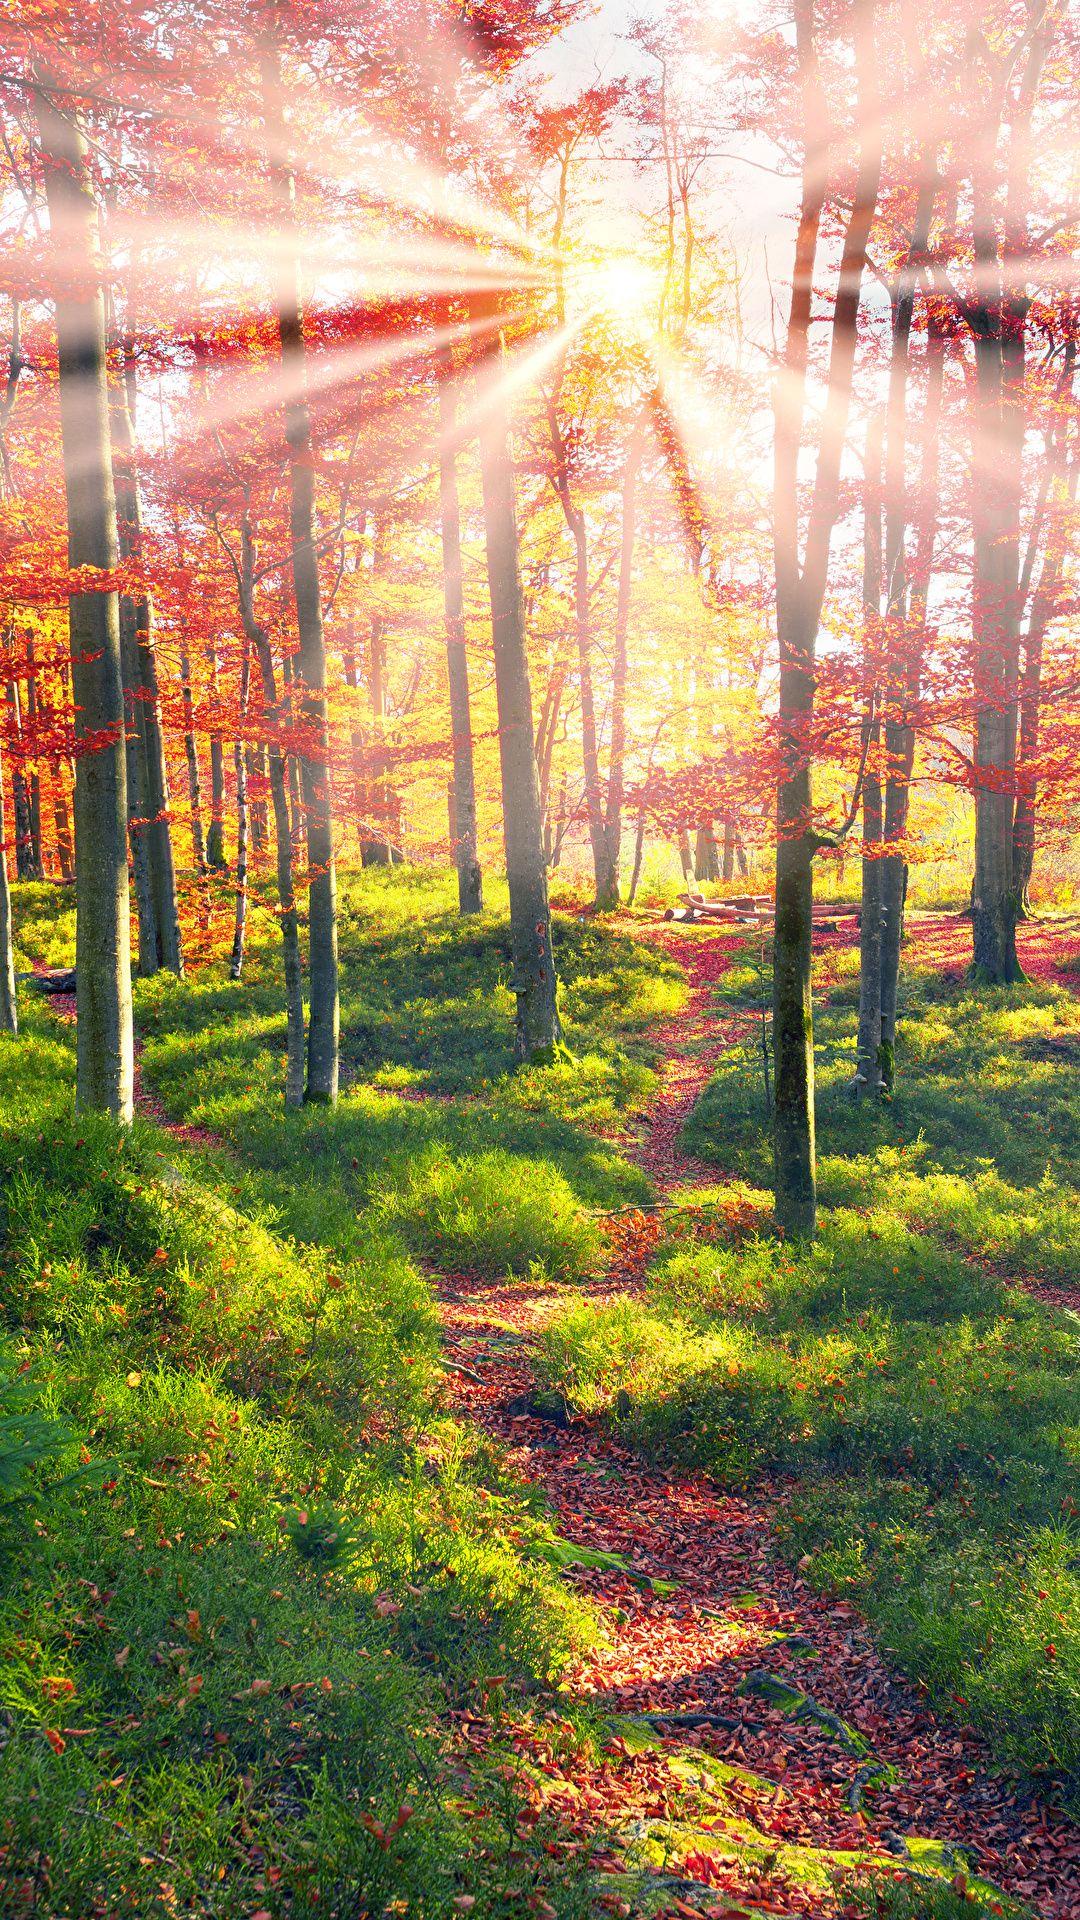 Autumn Forest Sun Pictures